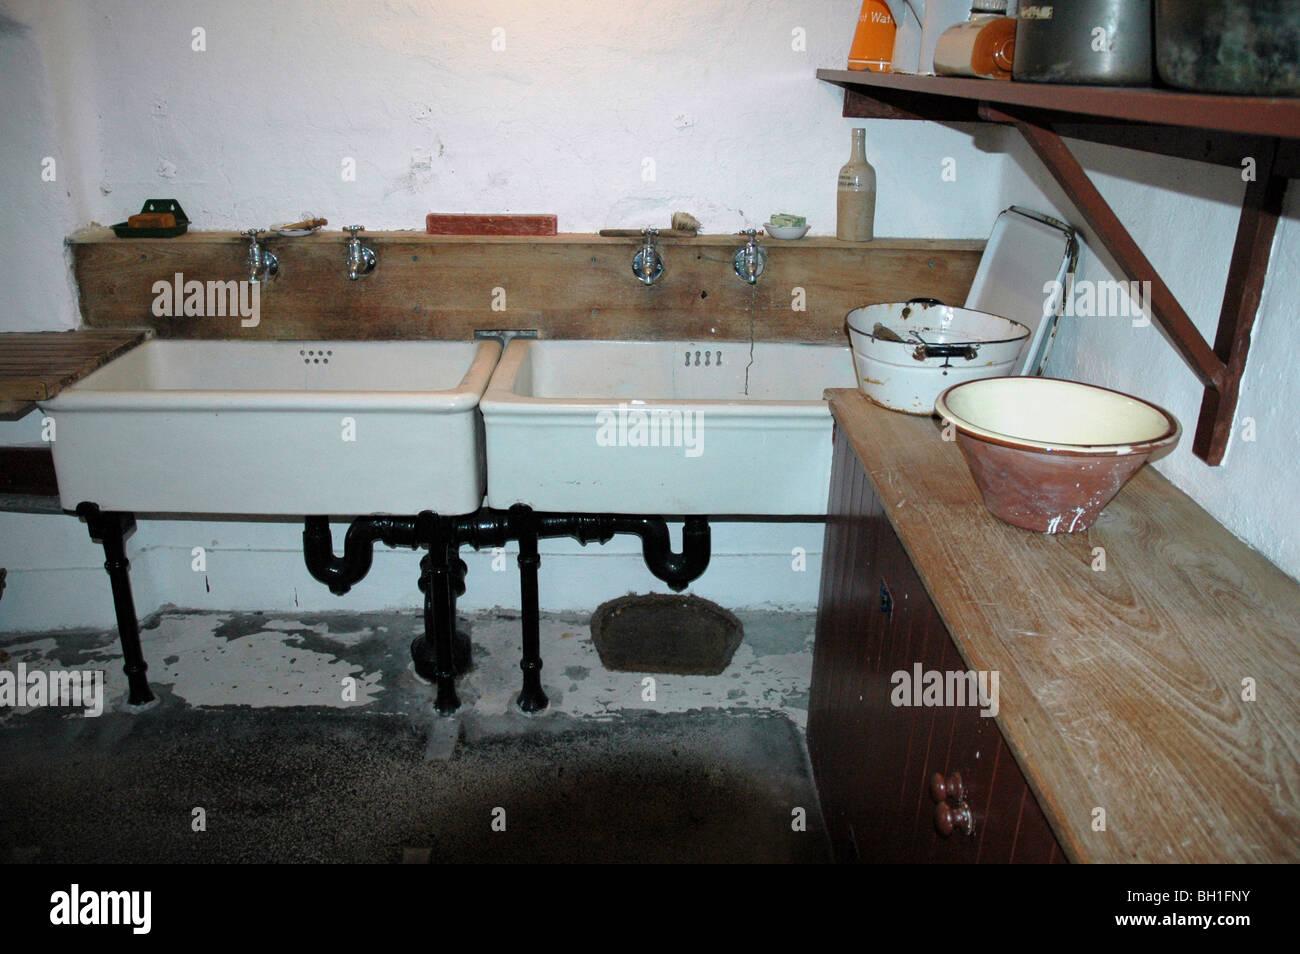 Victorian Kitchen Stock Photos & Victorian Kitchen Stock Images - Alamy